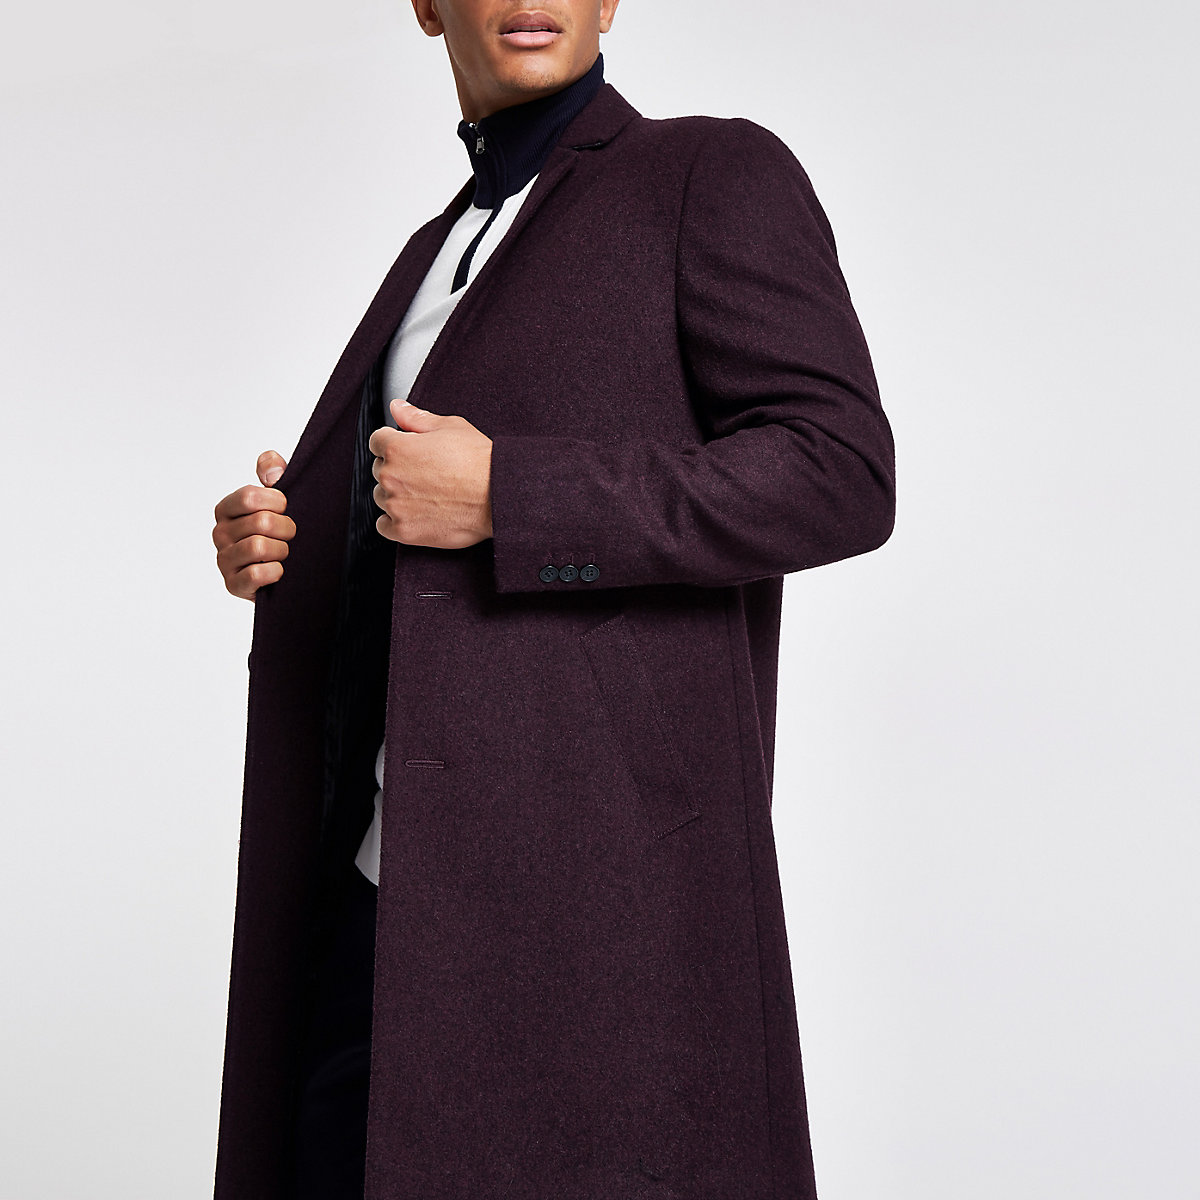 Burgundy wool blend overcoat